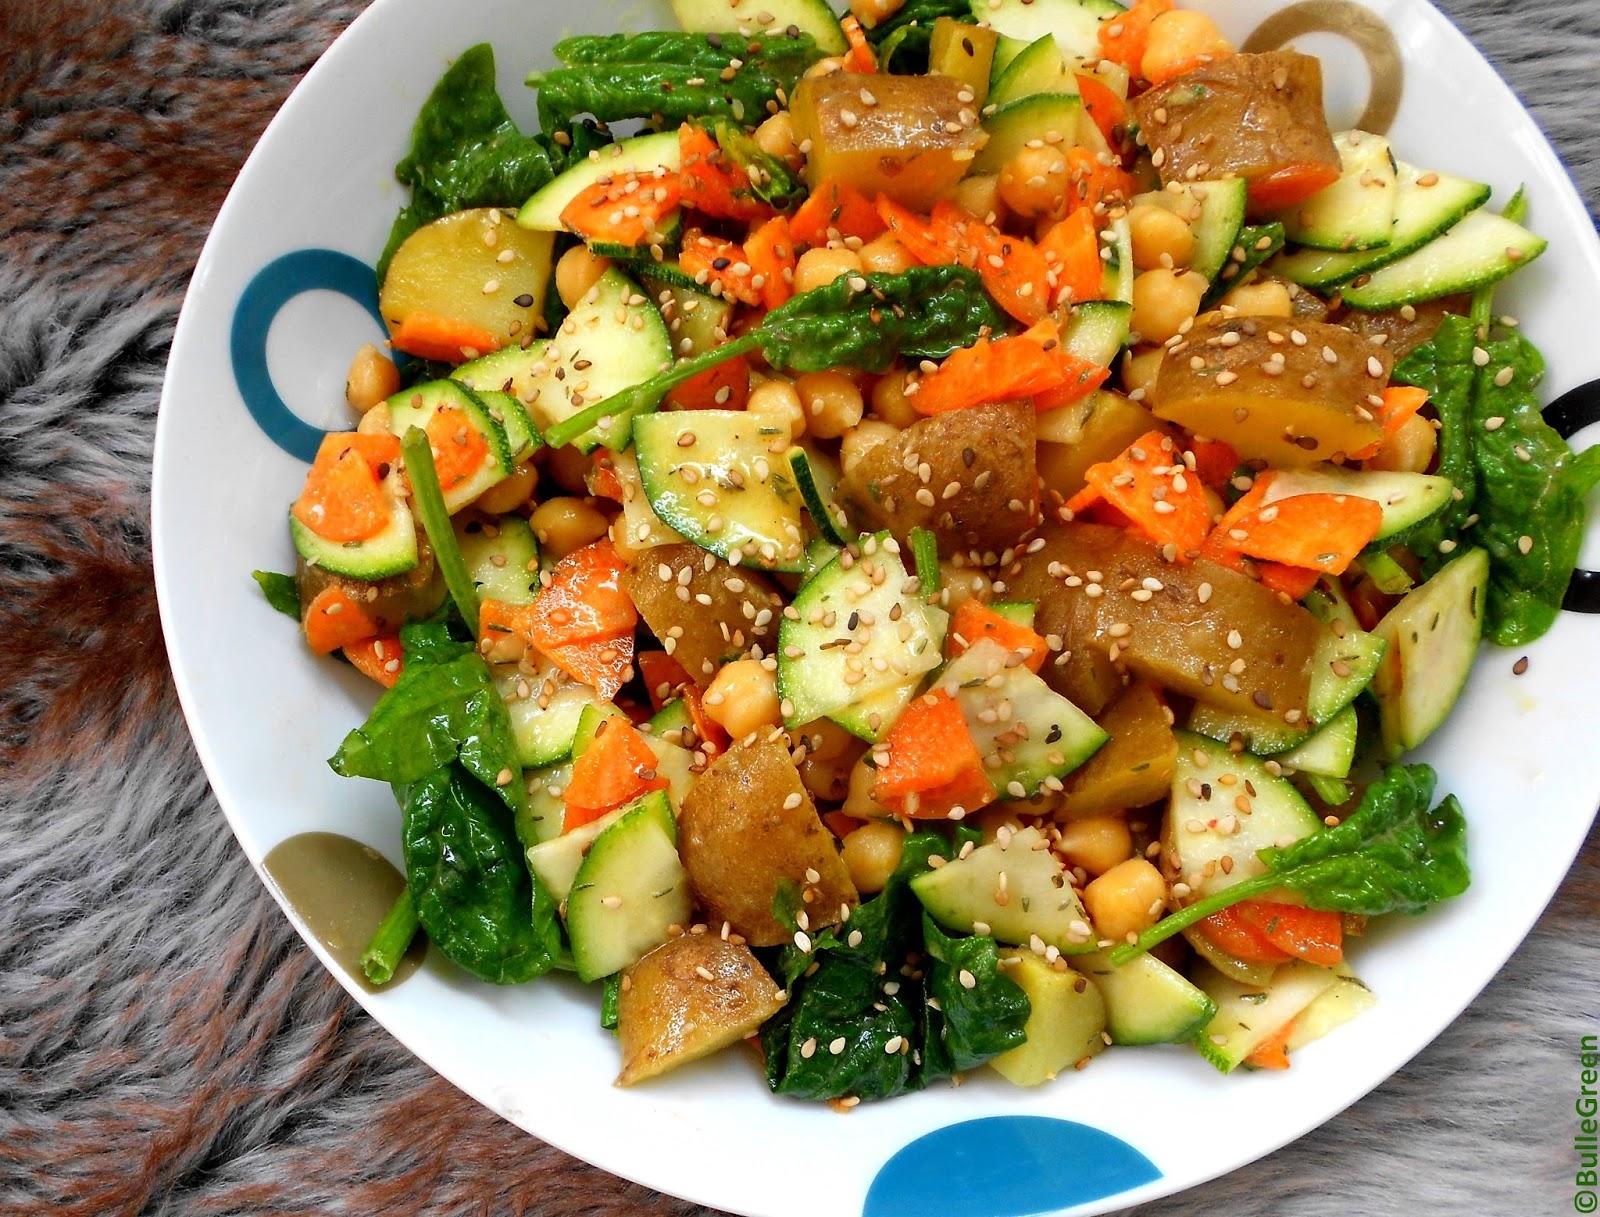 bulle green salade pomme de terre carotte courgette pois chiche. Black Bedroom Furniture Sets. Home Design Ideas